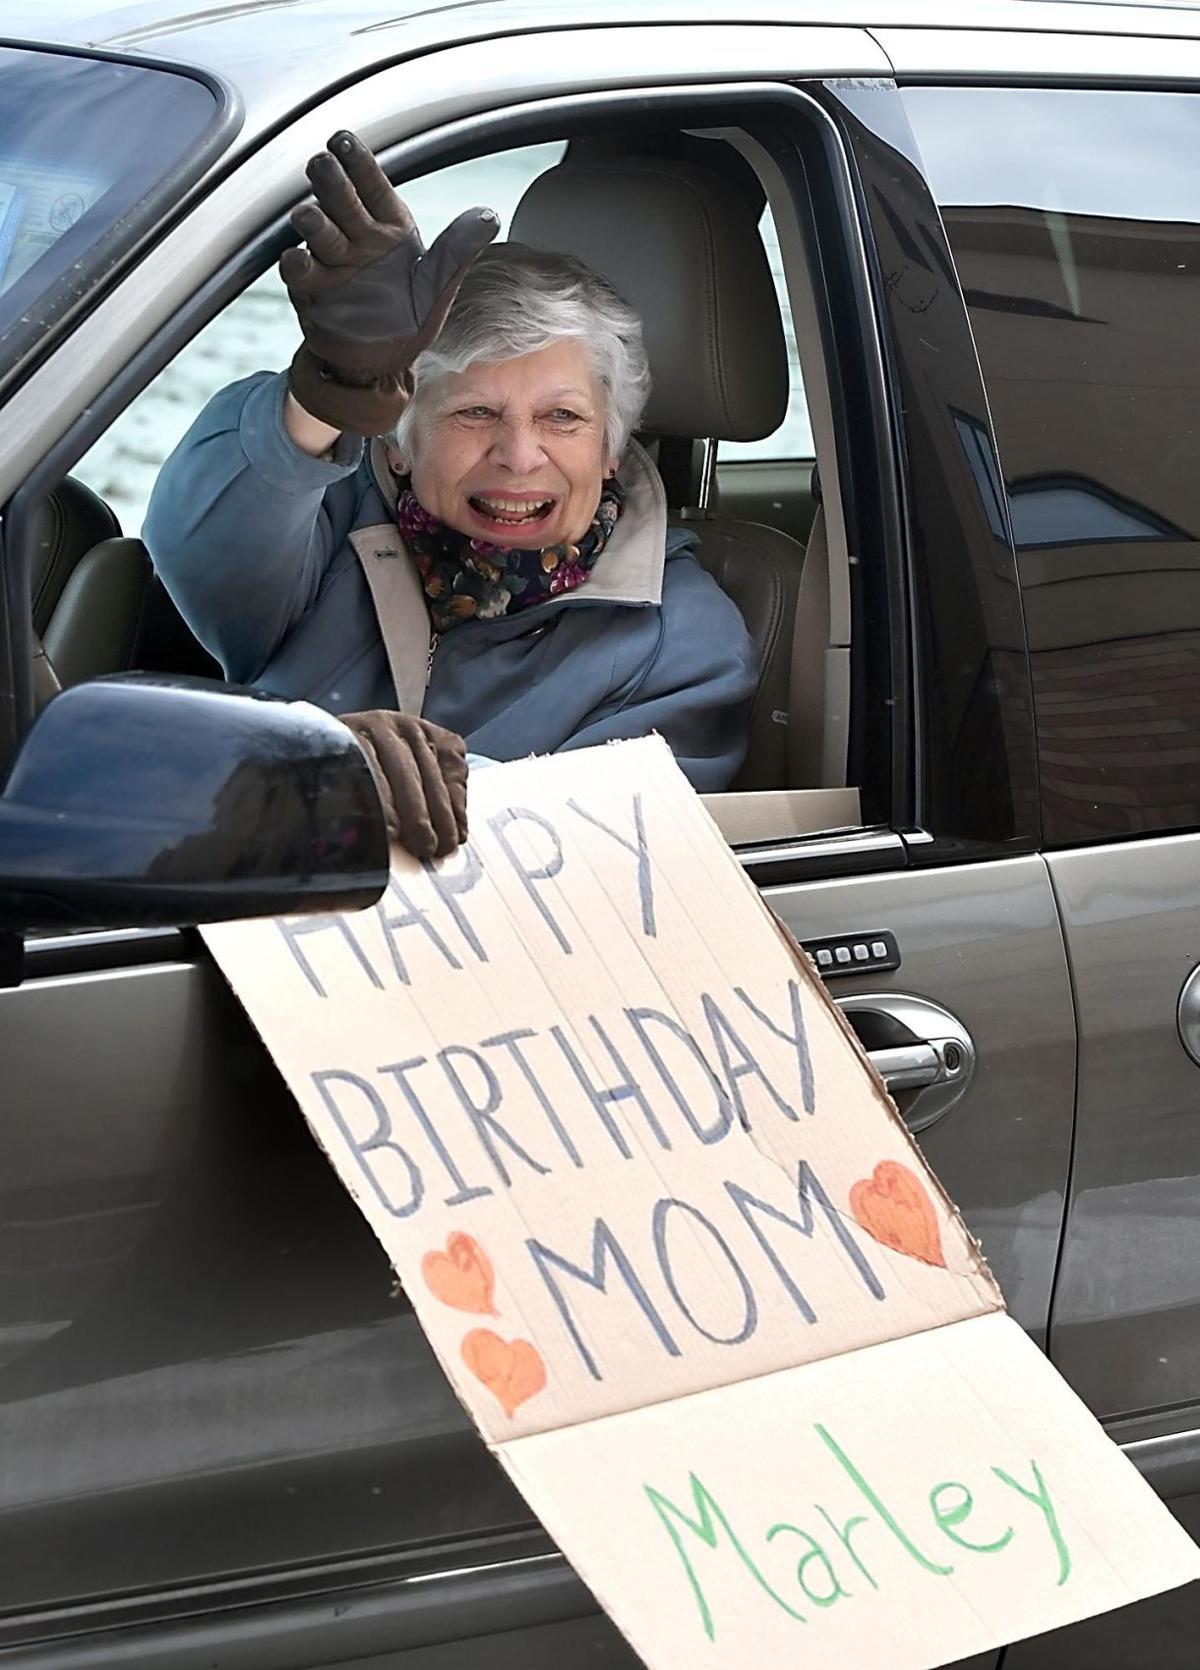 Drive by birthday 4